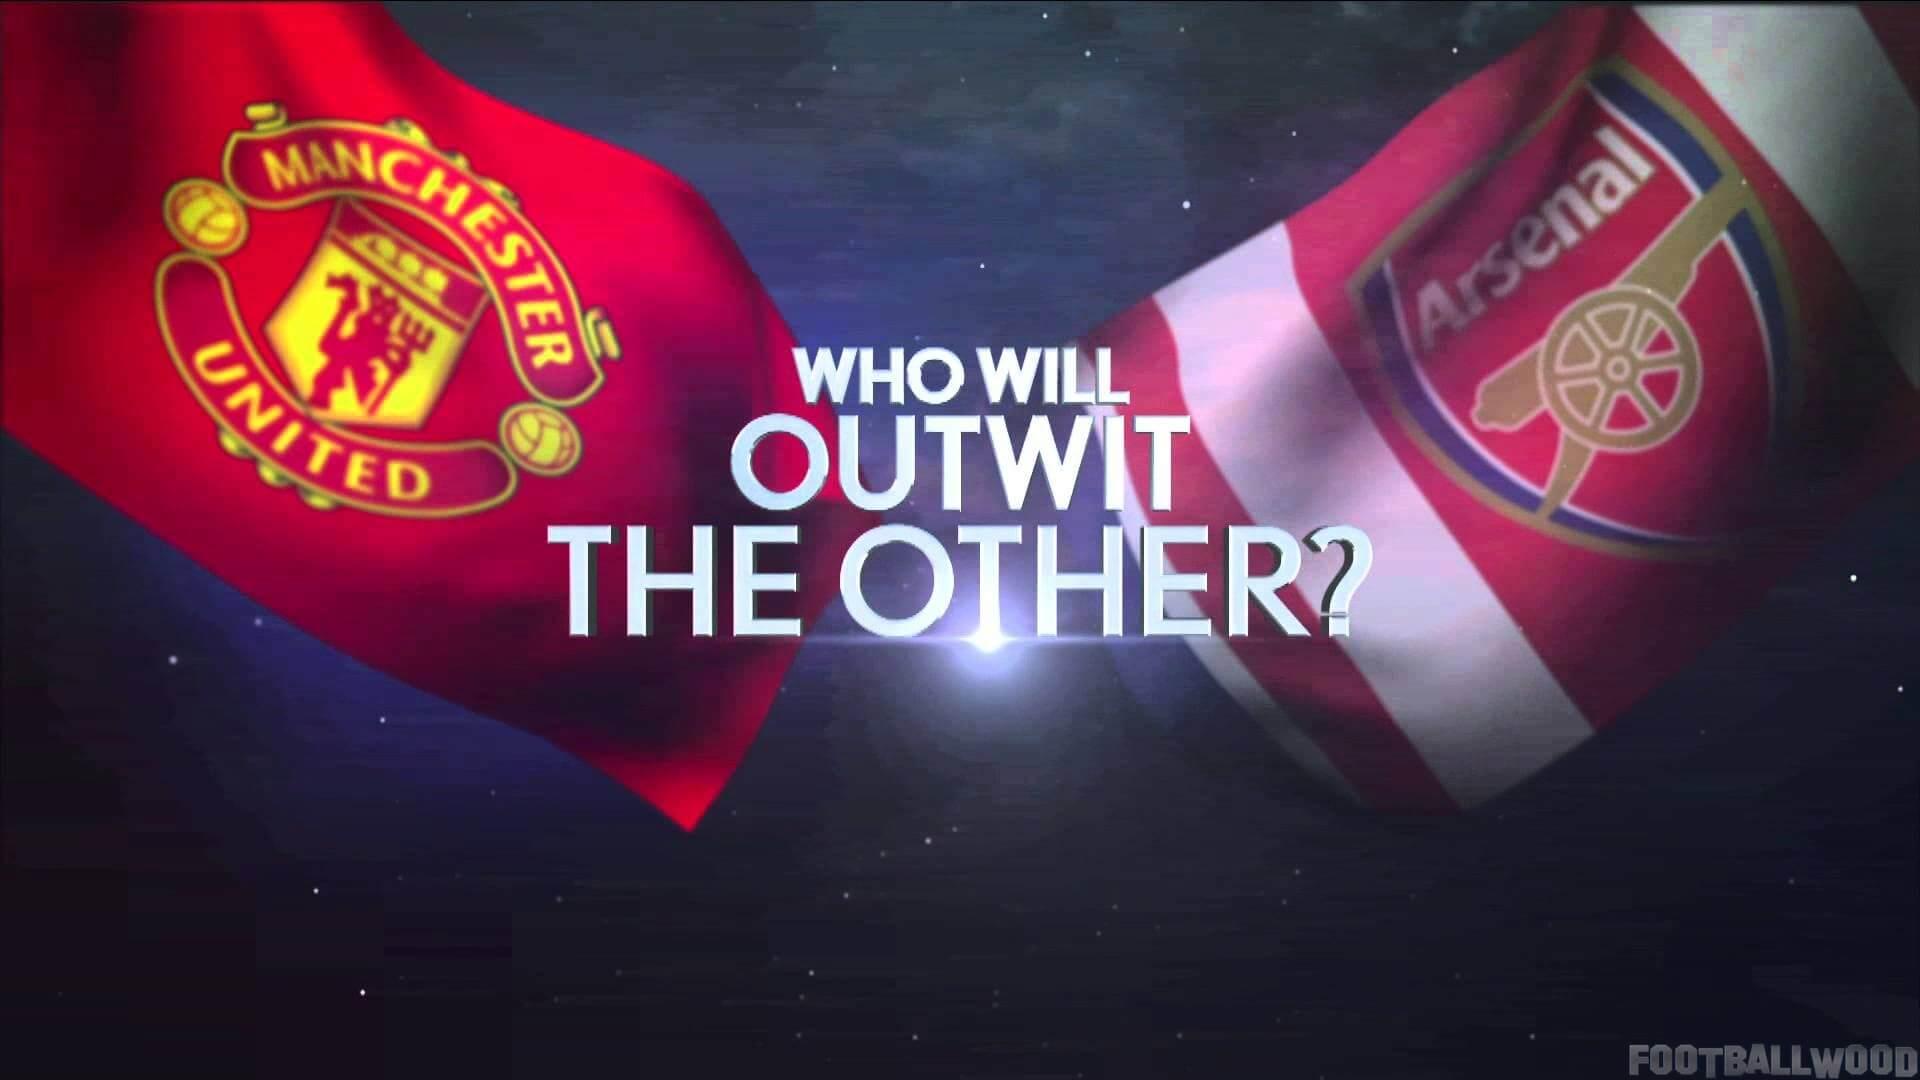 hd wallpaper of manchester united vs